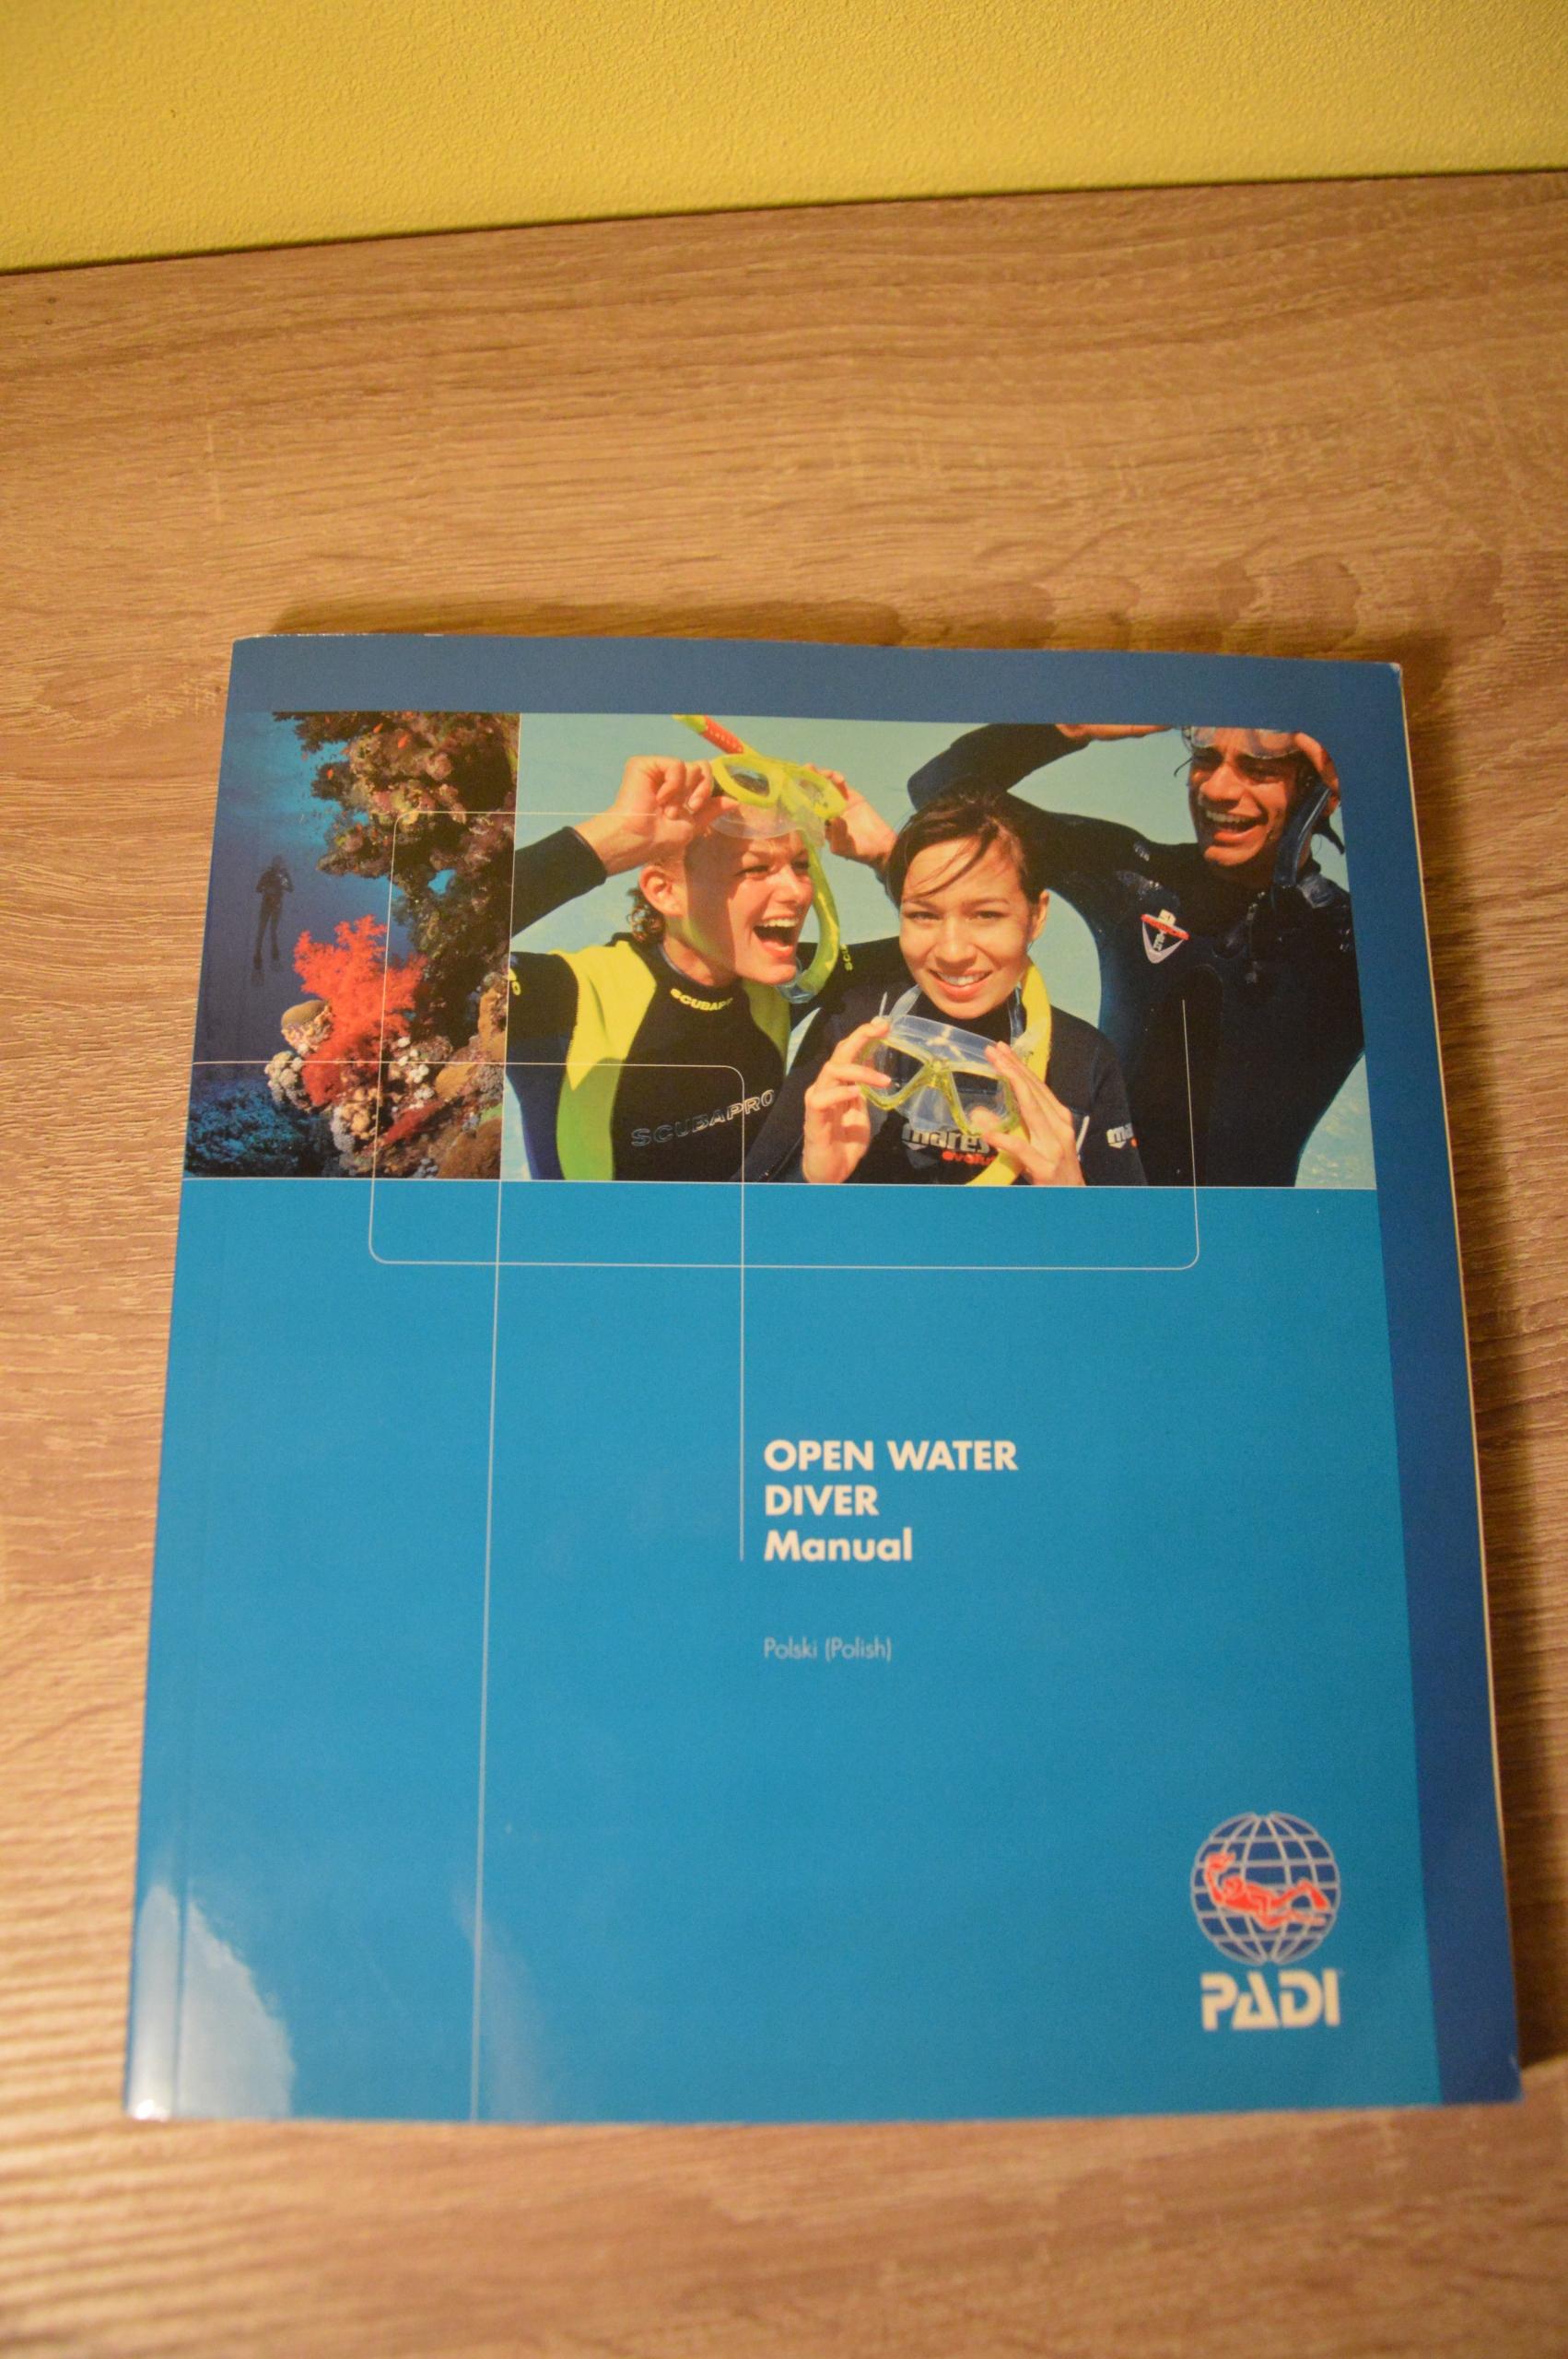 Open Water Diver podęcznik POLSKI jak NOWY